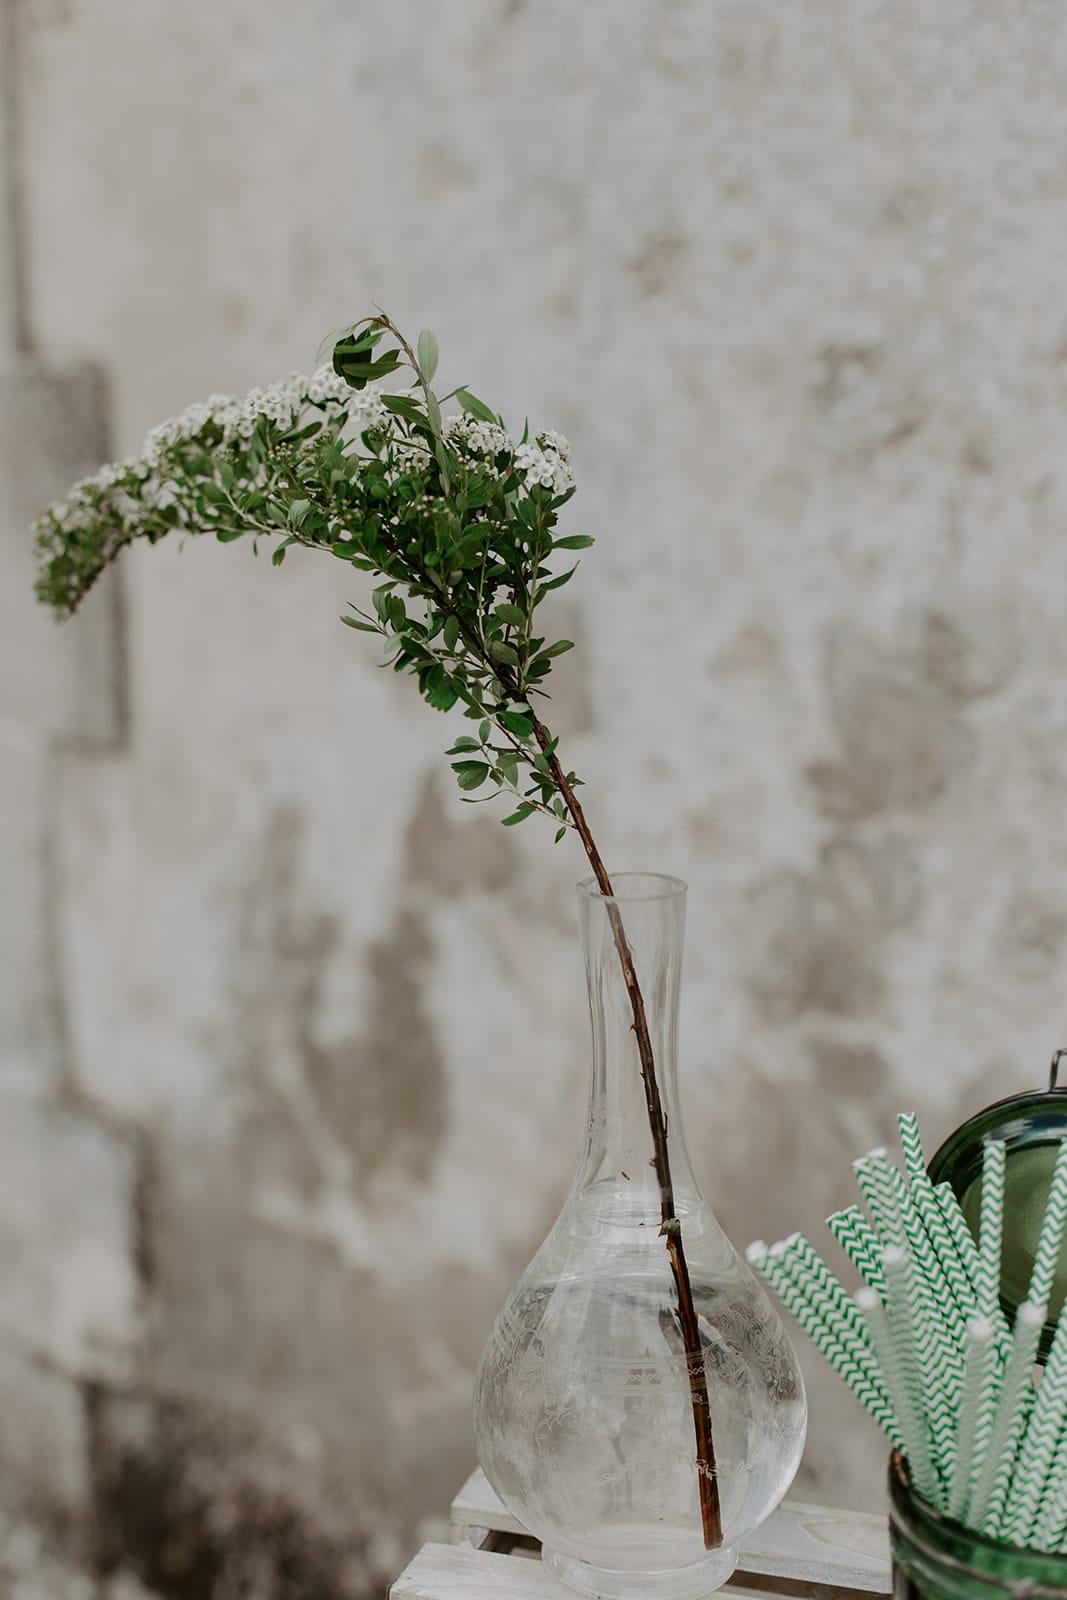 mariage_chateau_la_flocelliere_vendee_flavie_nelly_photographe-105-obonheurdesdames-decoration-mariage-location-vegetal